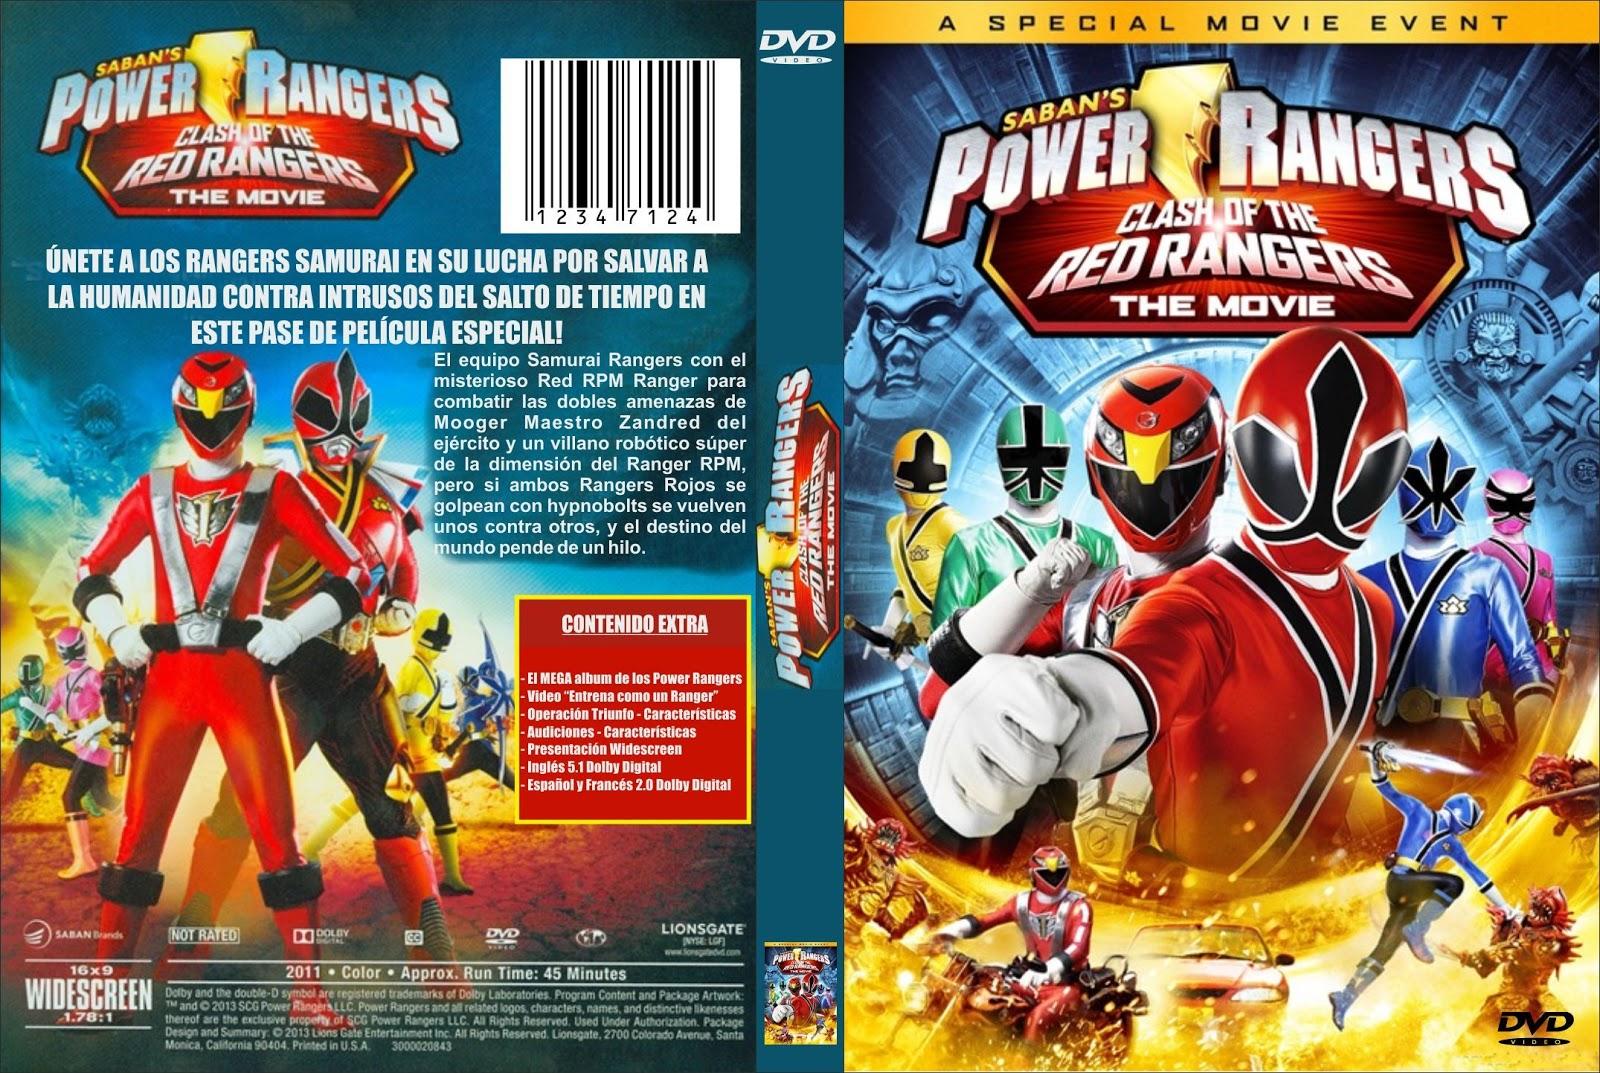 Power Rangers: Samurai Clash Of The Red Rangers The Movie (2013) - Hindi